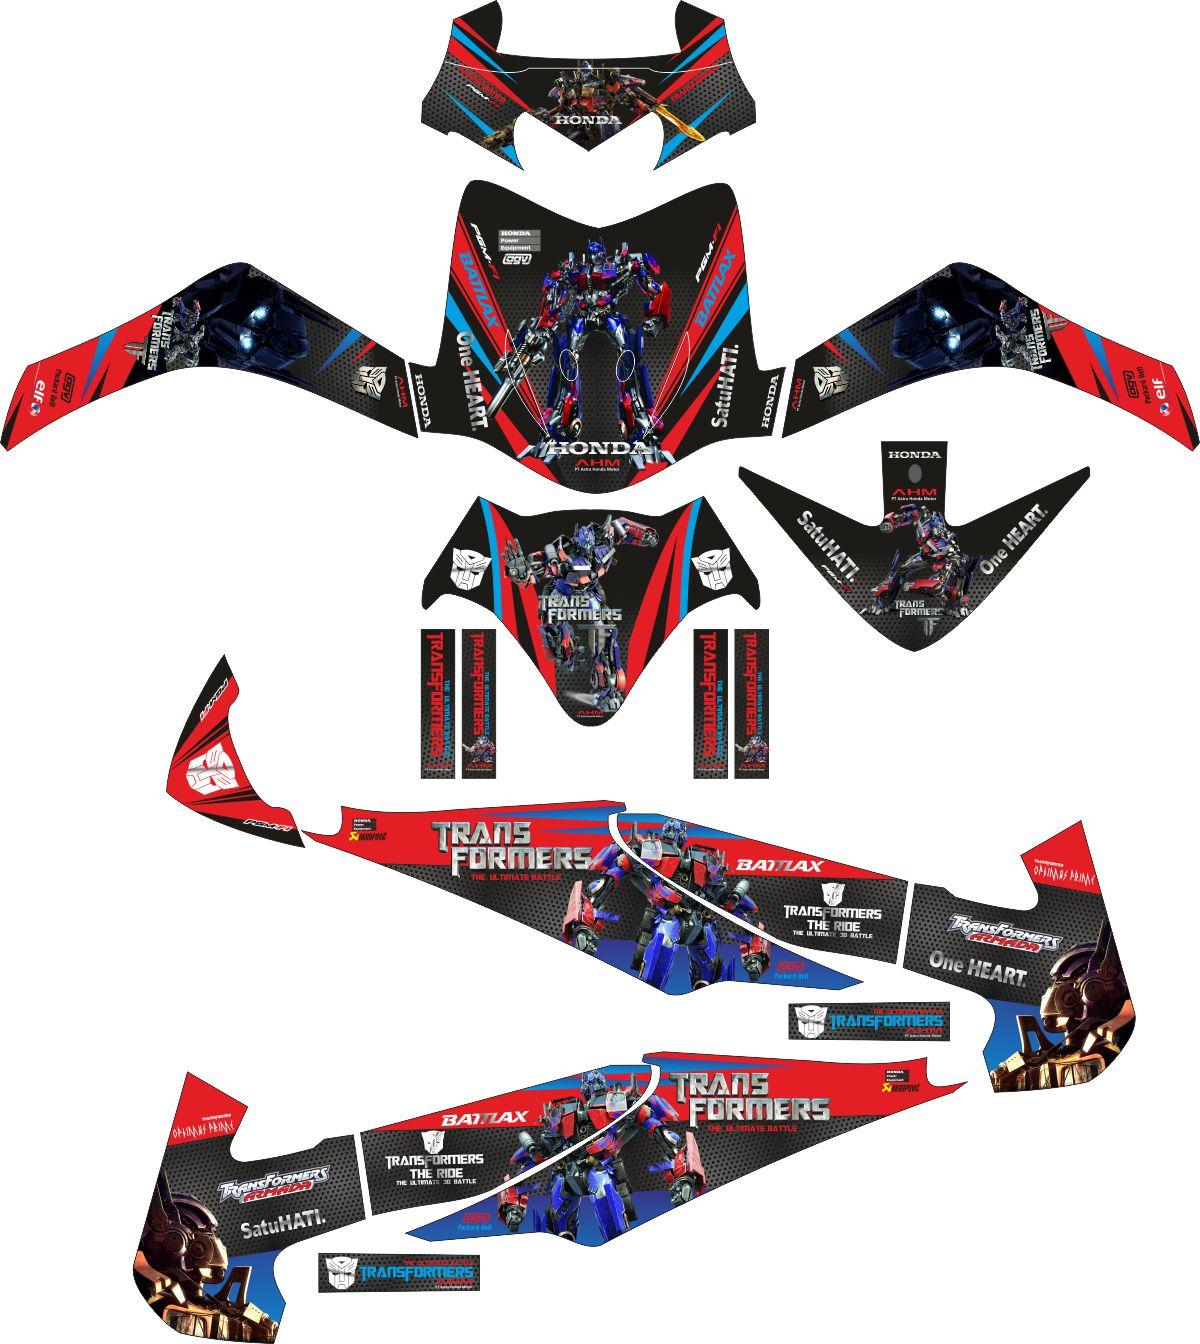 Комплект наклеек на скутер HONDA REVO TRANSFORMER OPTIMUS PRIME